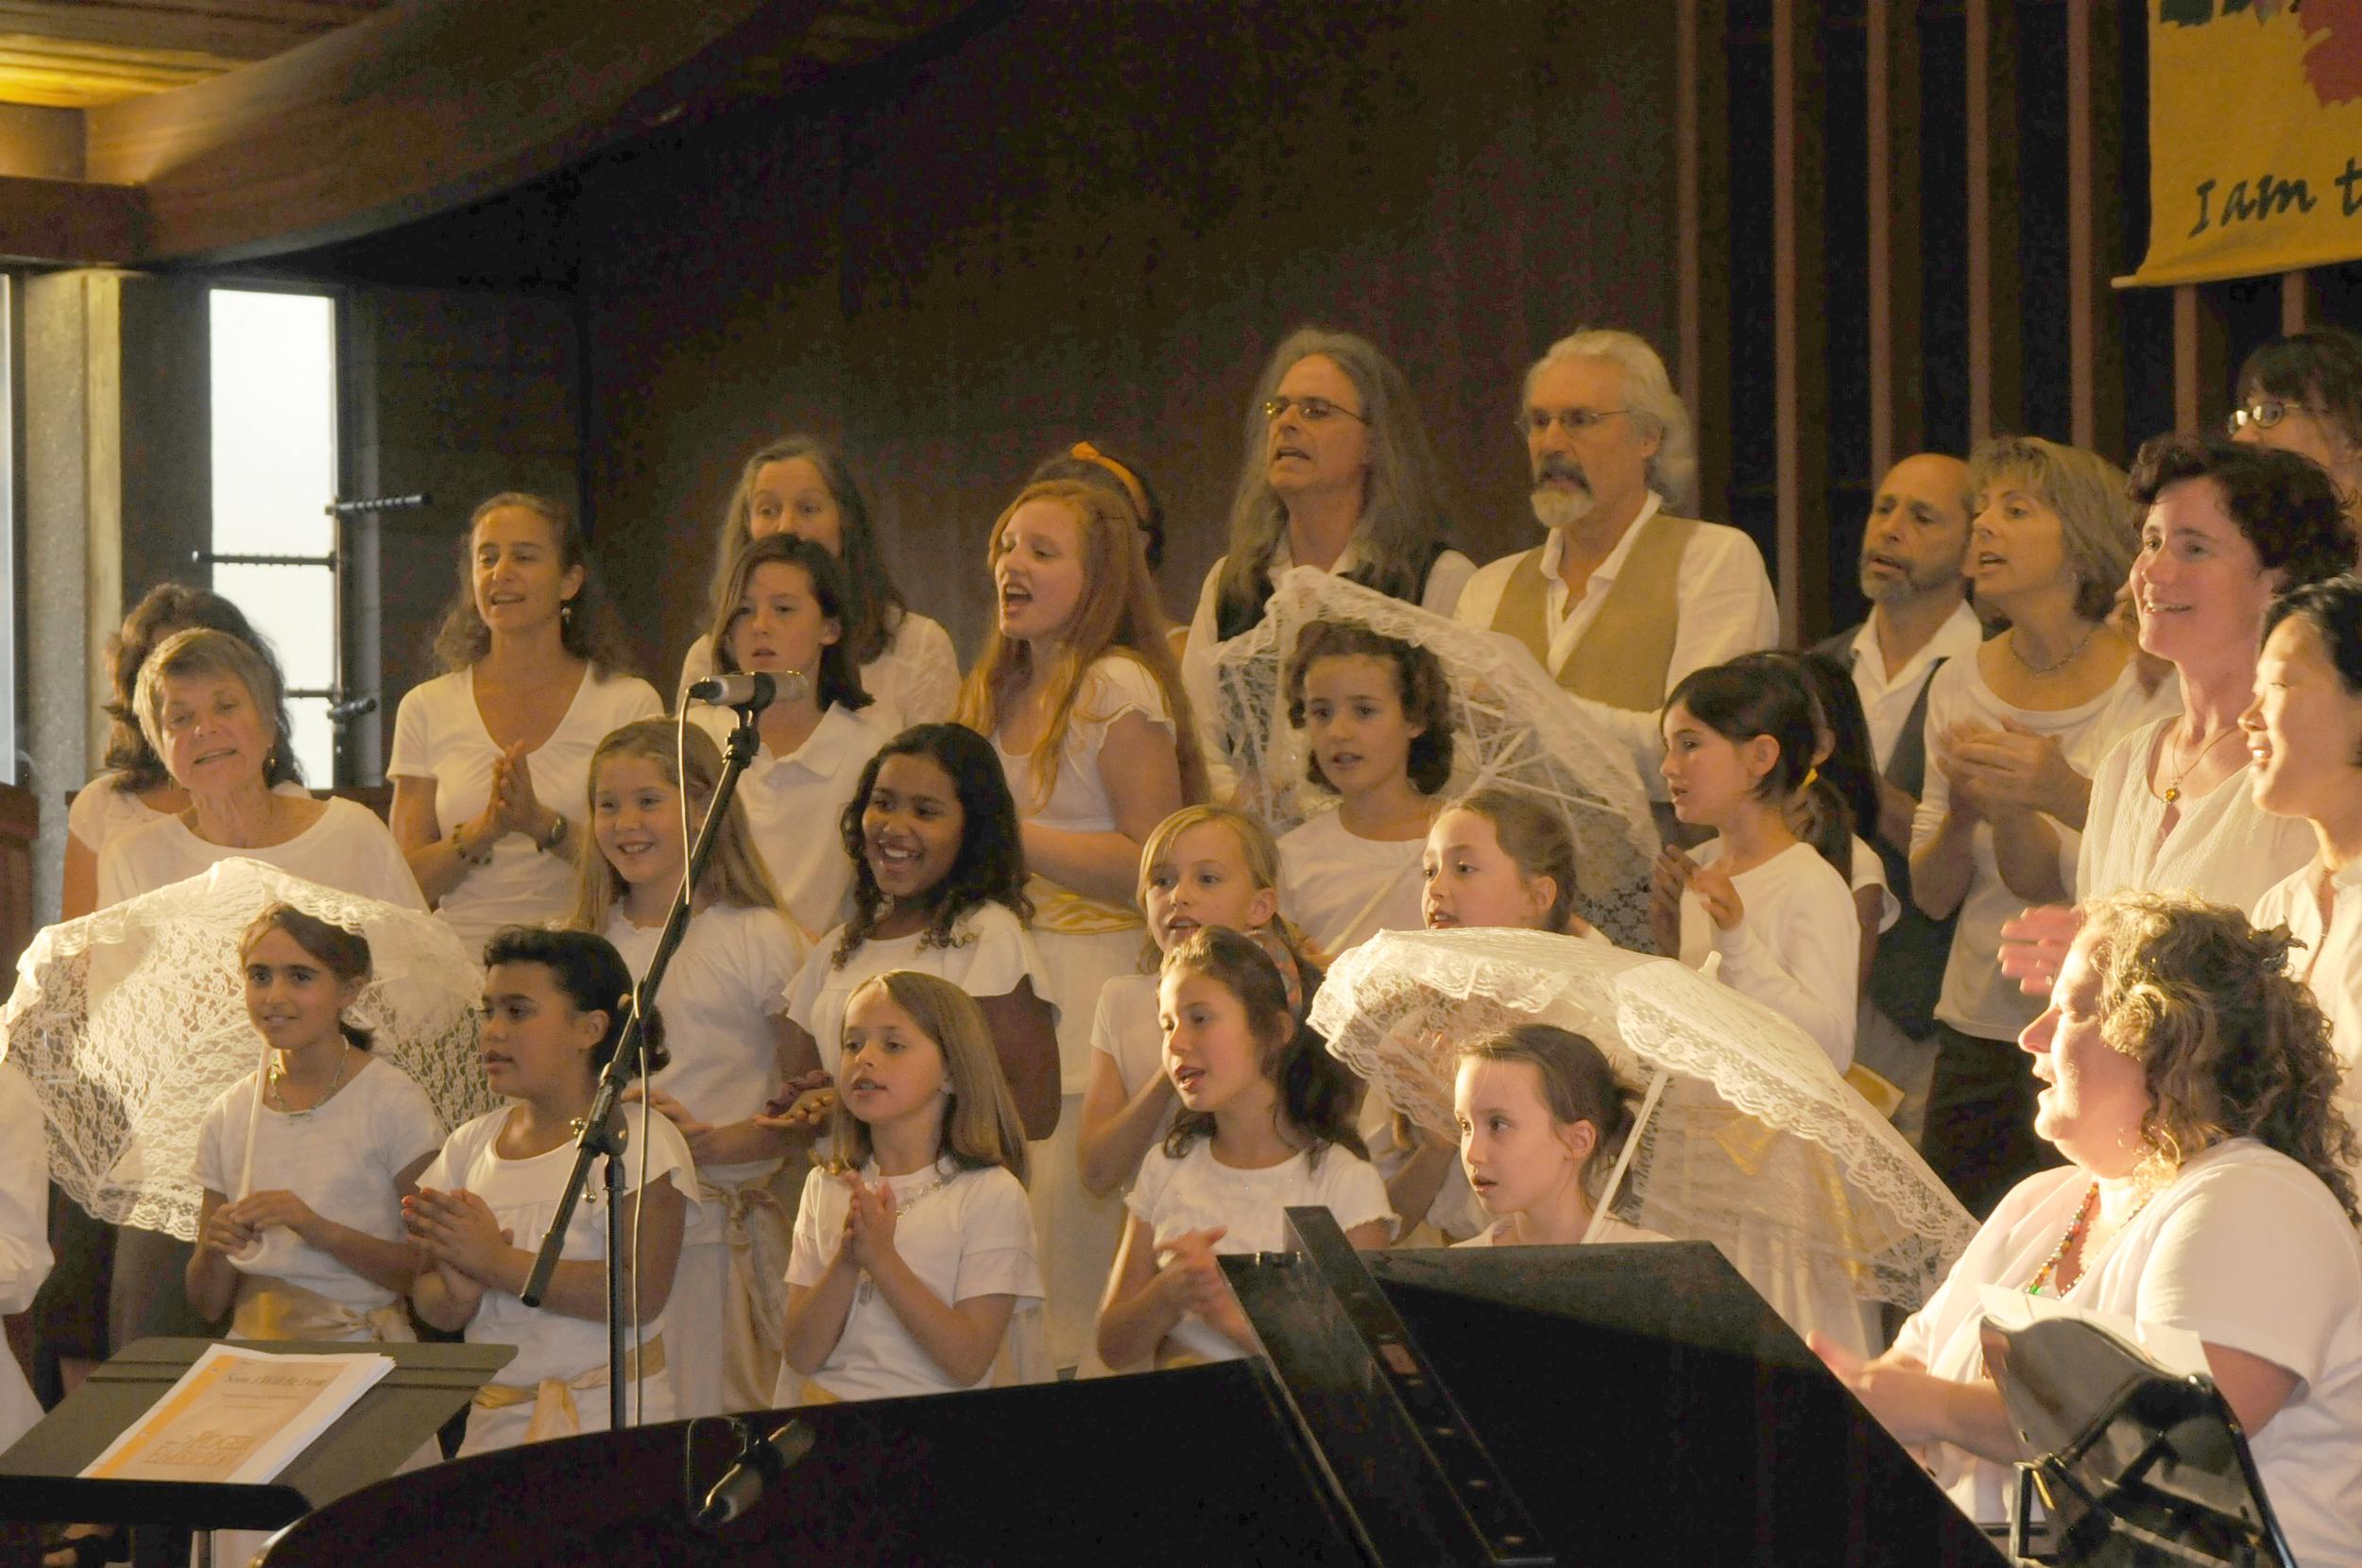 Bija Adult Vocal Ensemble singing with the Bija Children's Choir at Harvest Concert 2009